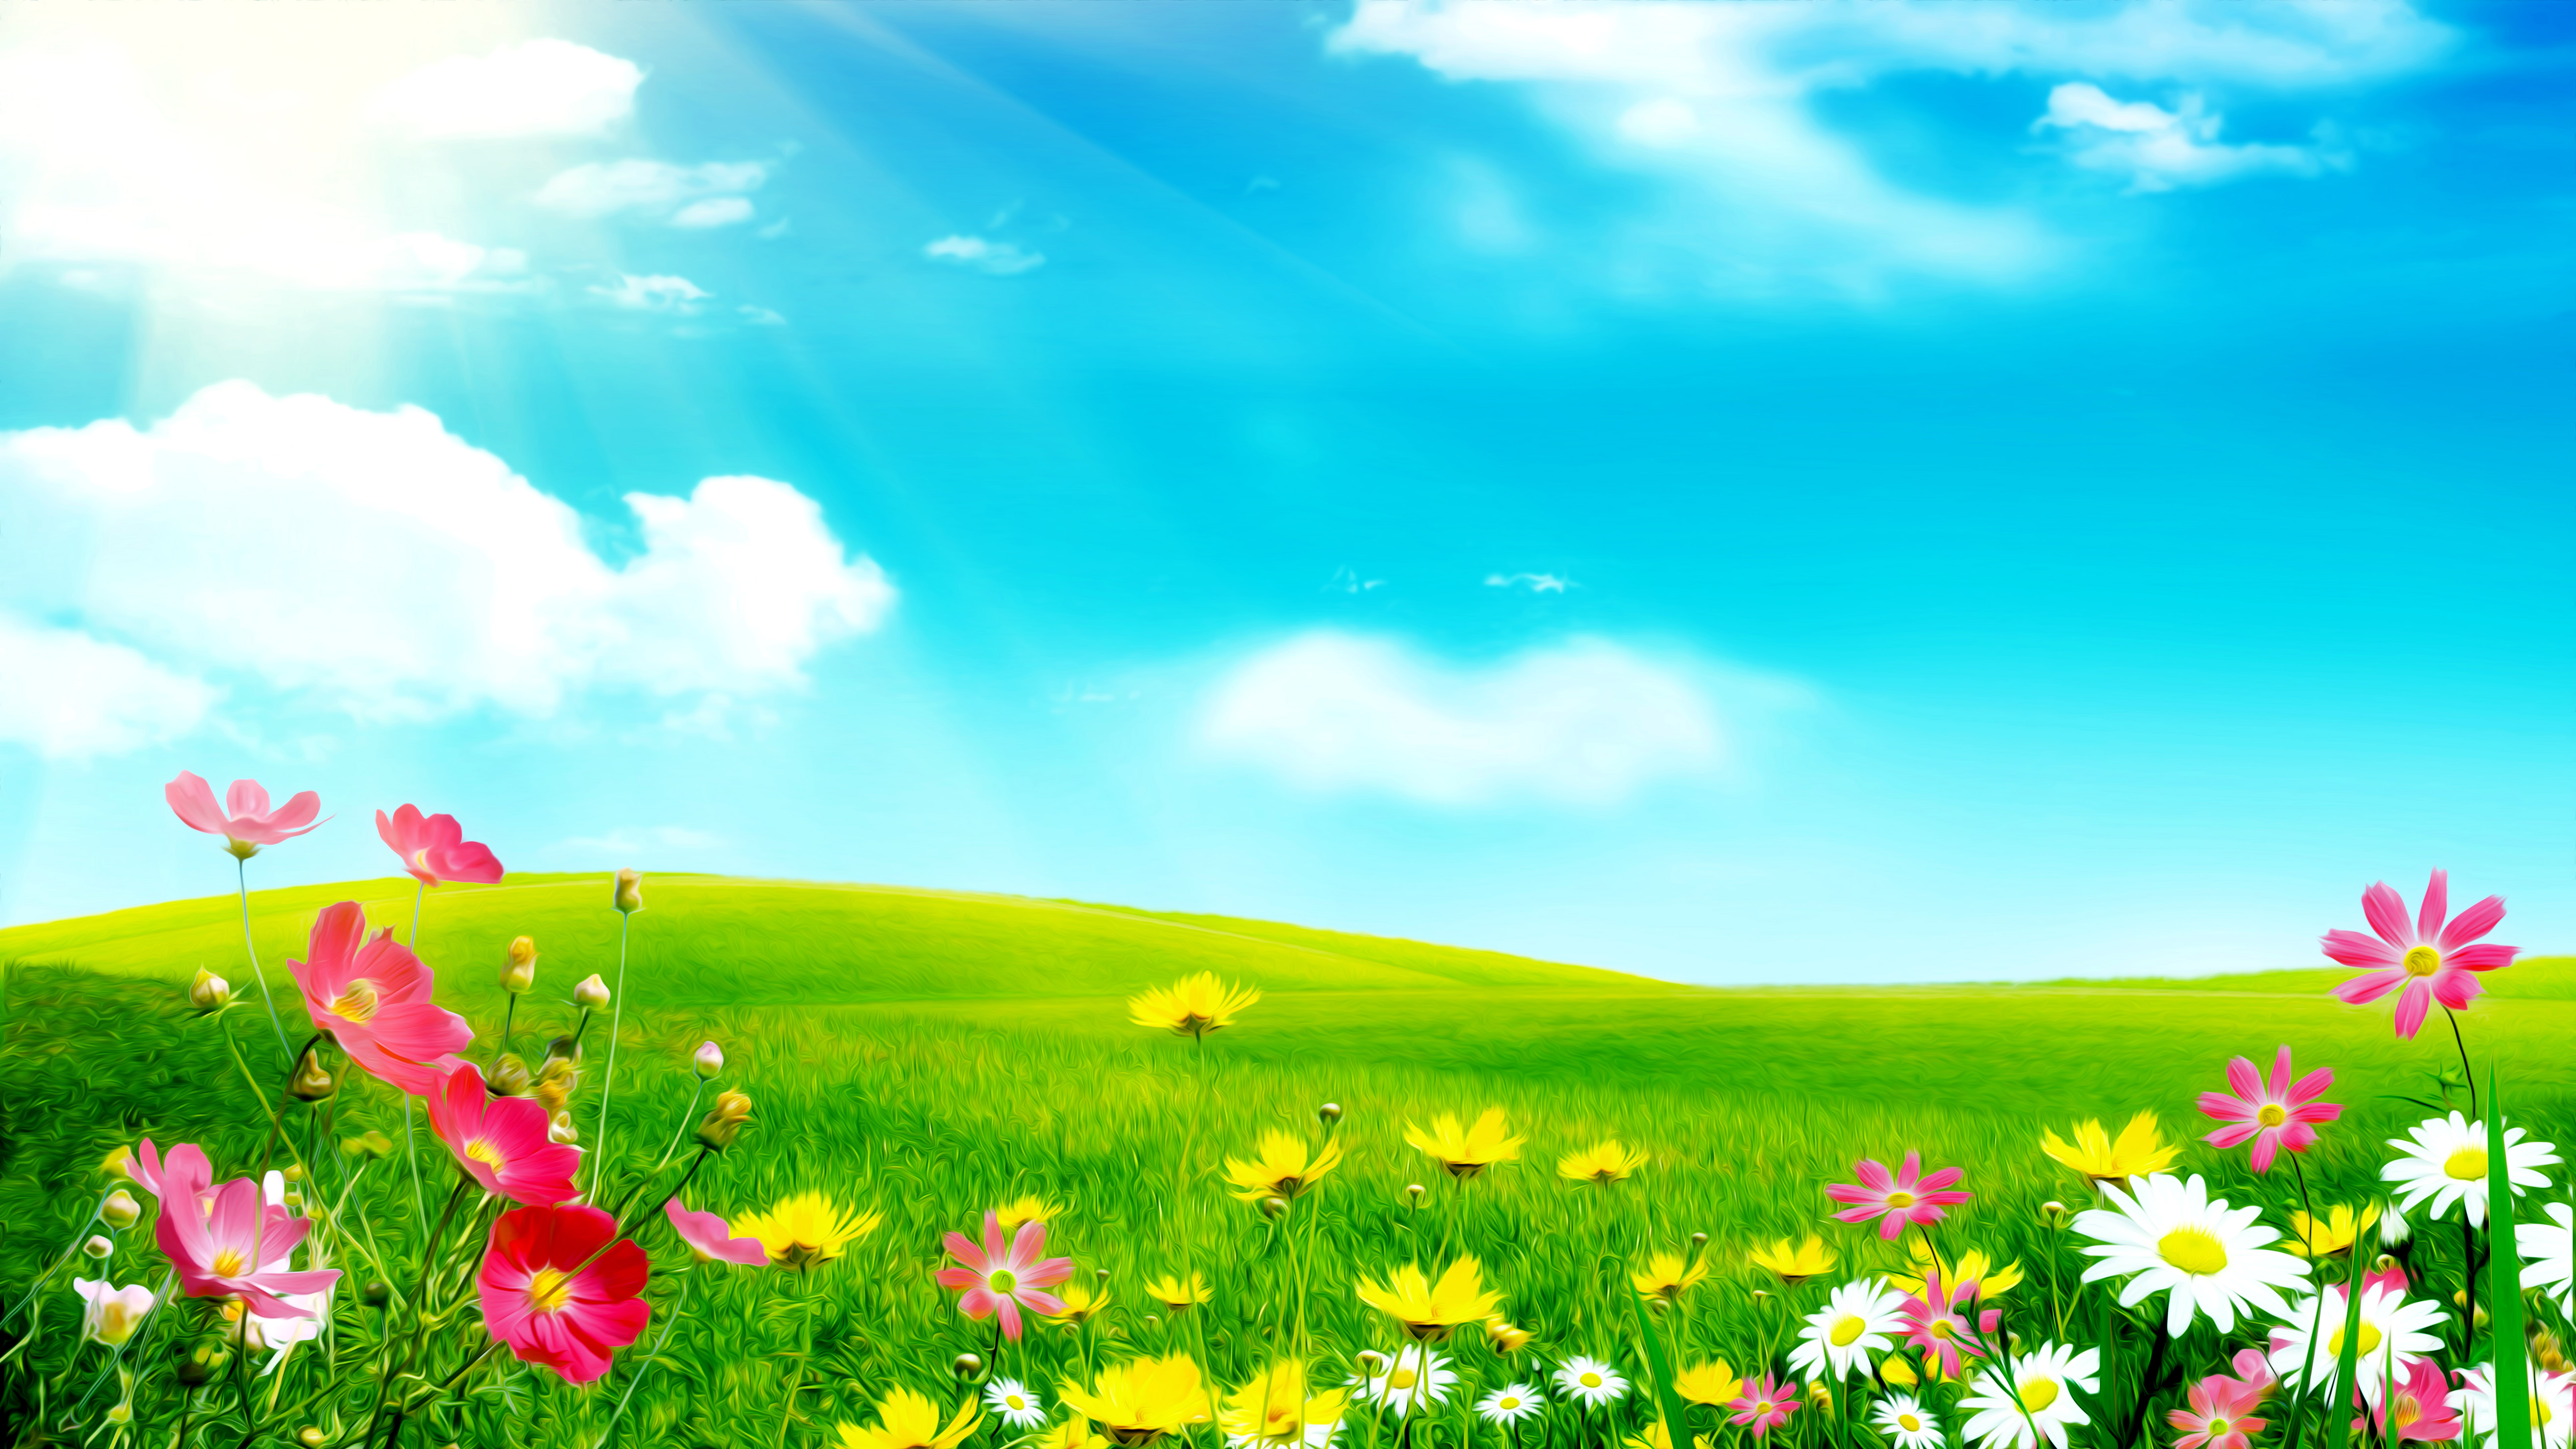 Fondo Animado Campo Parque Full Hd Animate Background: Free Desktop Wallpapers For Widescreen, HD